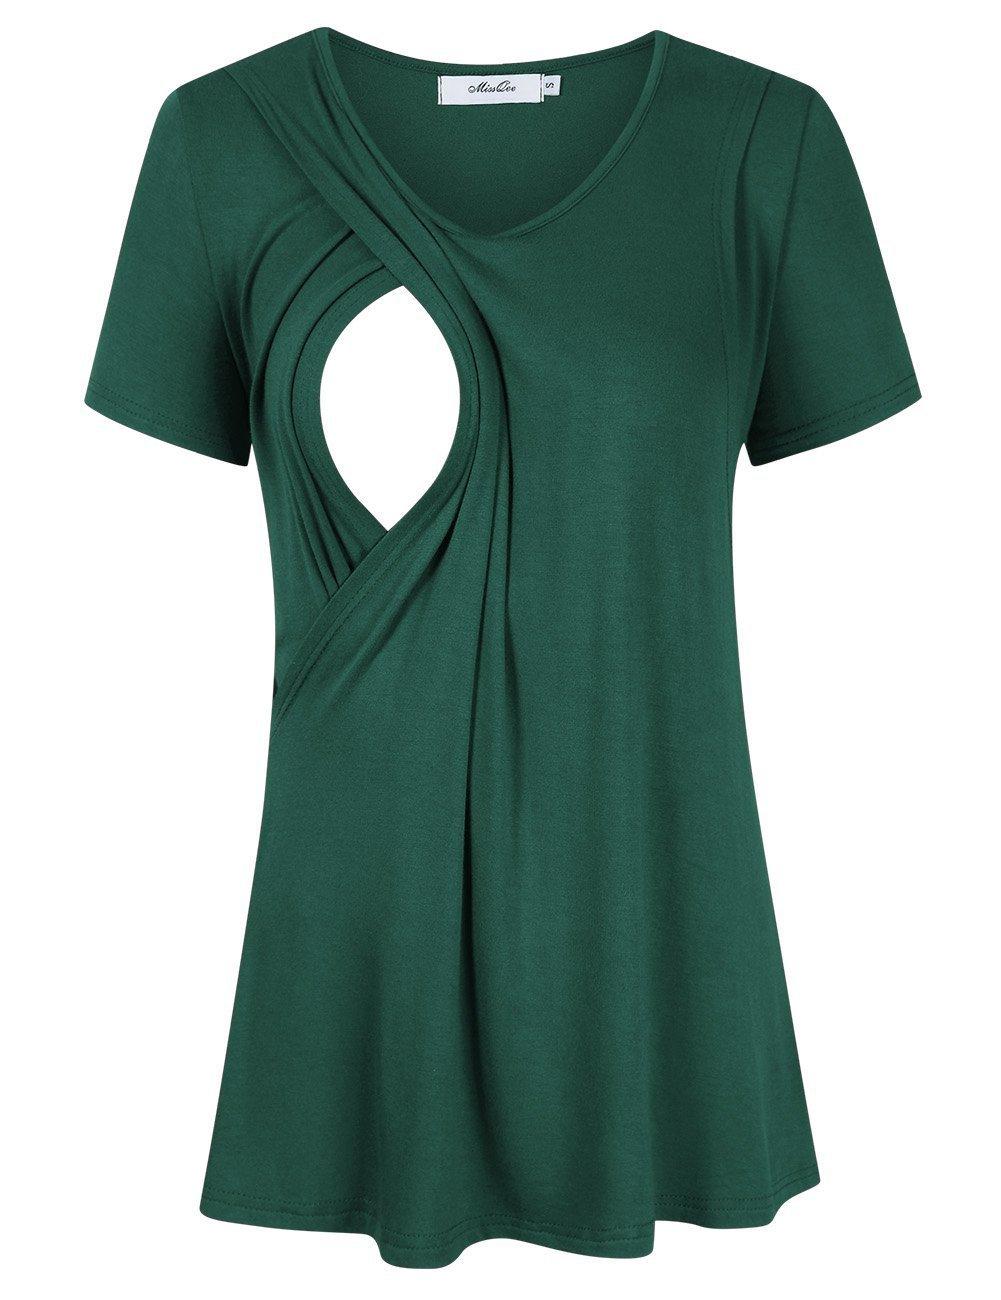 MissQee Maternity Nursing Tops Short Sleeve Breastfeeding T-Shirts M Grass Green